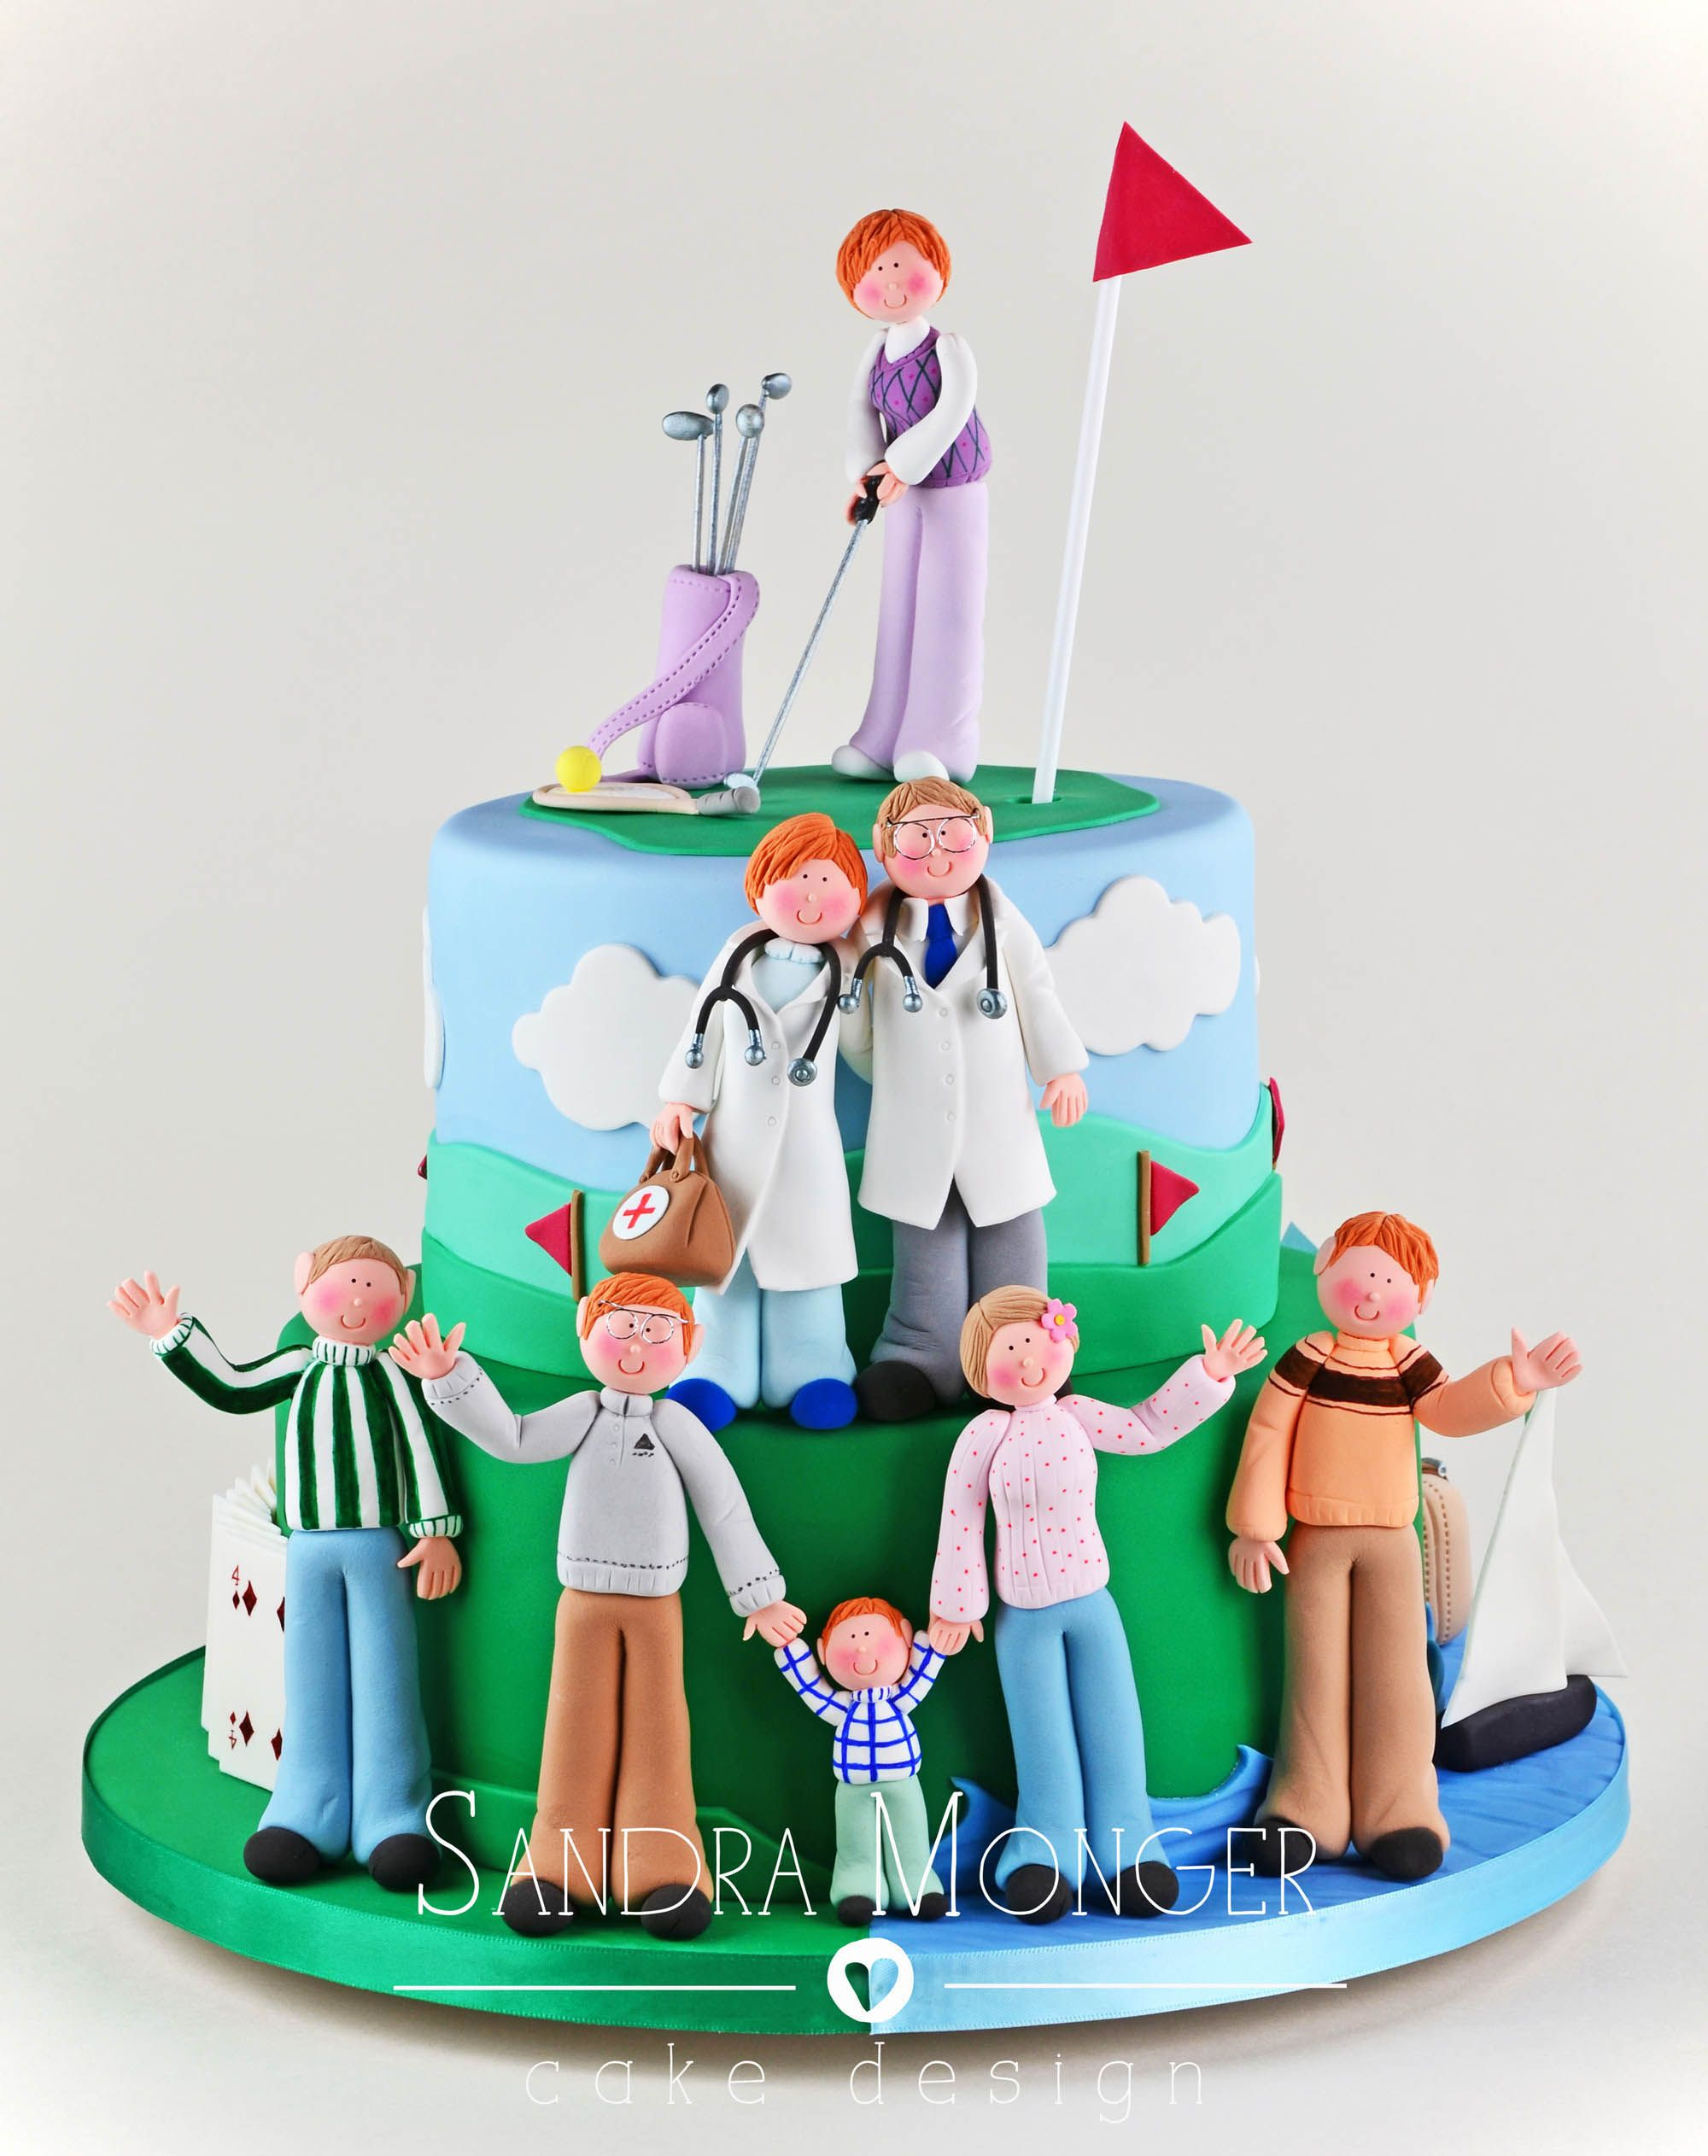 Hobby Birthday Cake - golf, tennis, bridge, sailing, family!